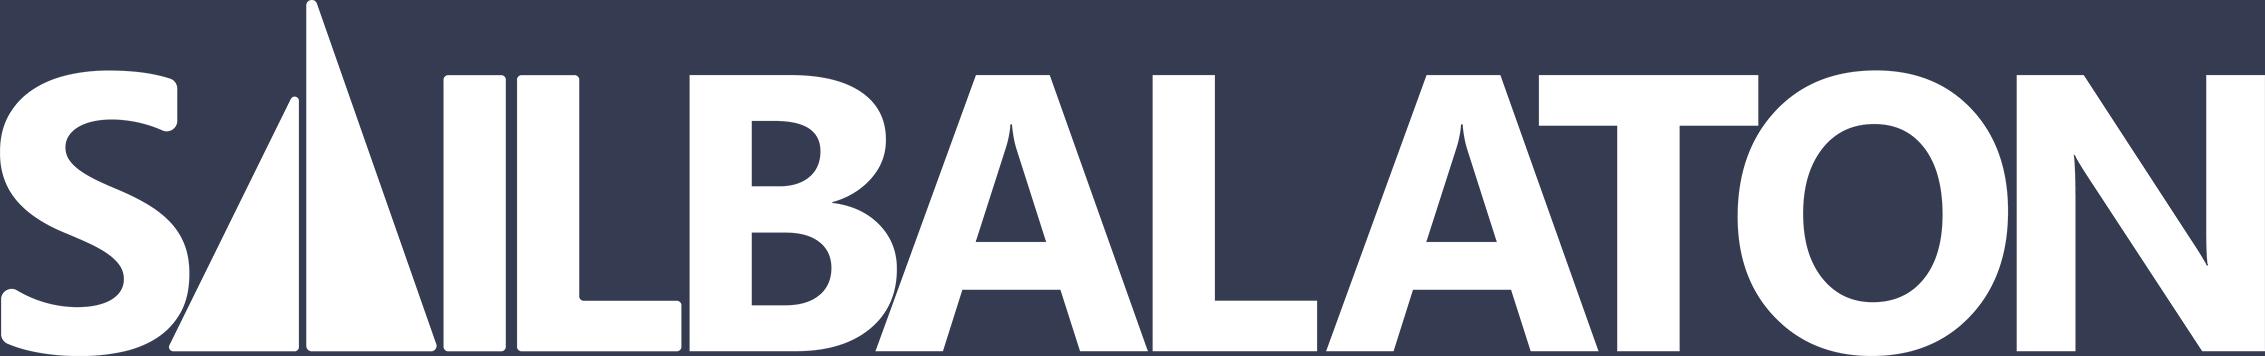 sailbalaton_feher